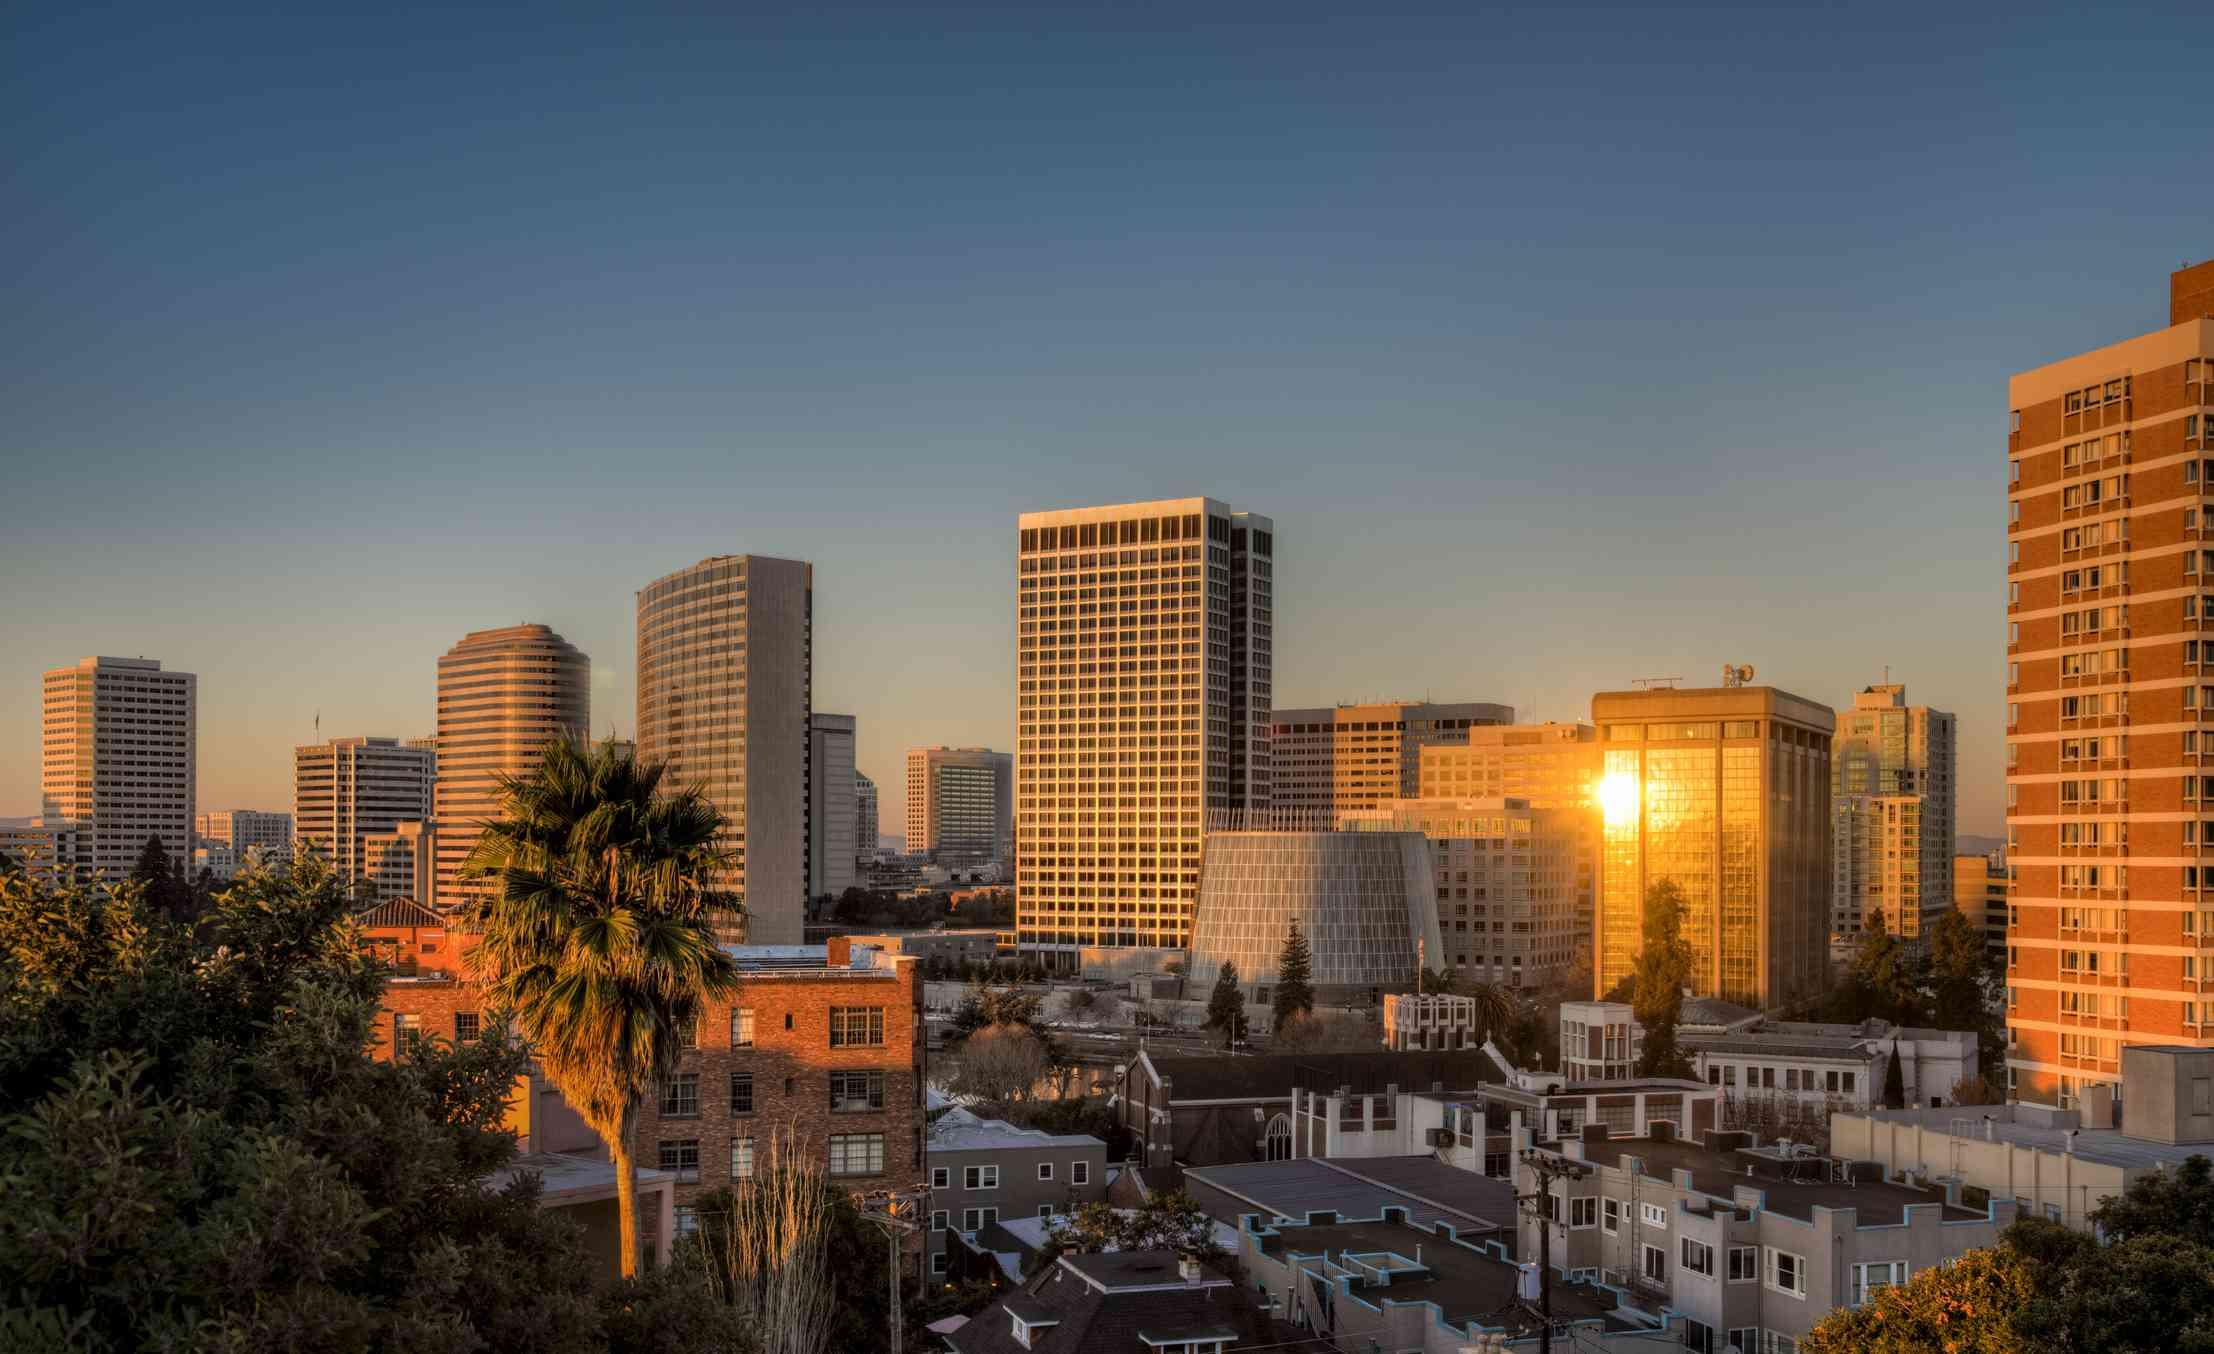 Skyline of Oakland at sunrise